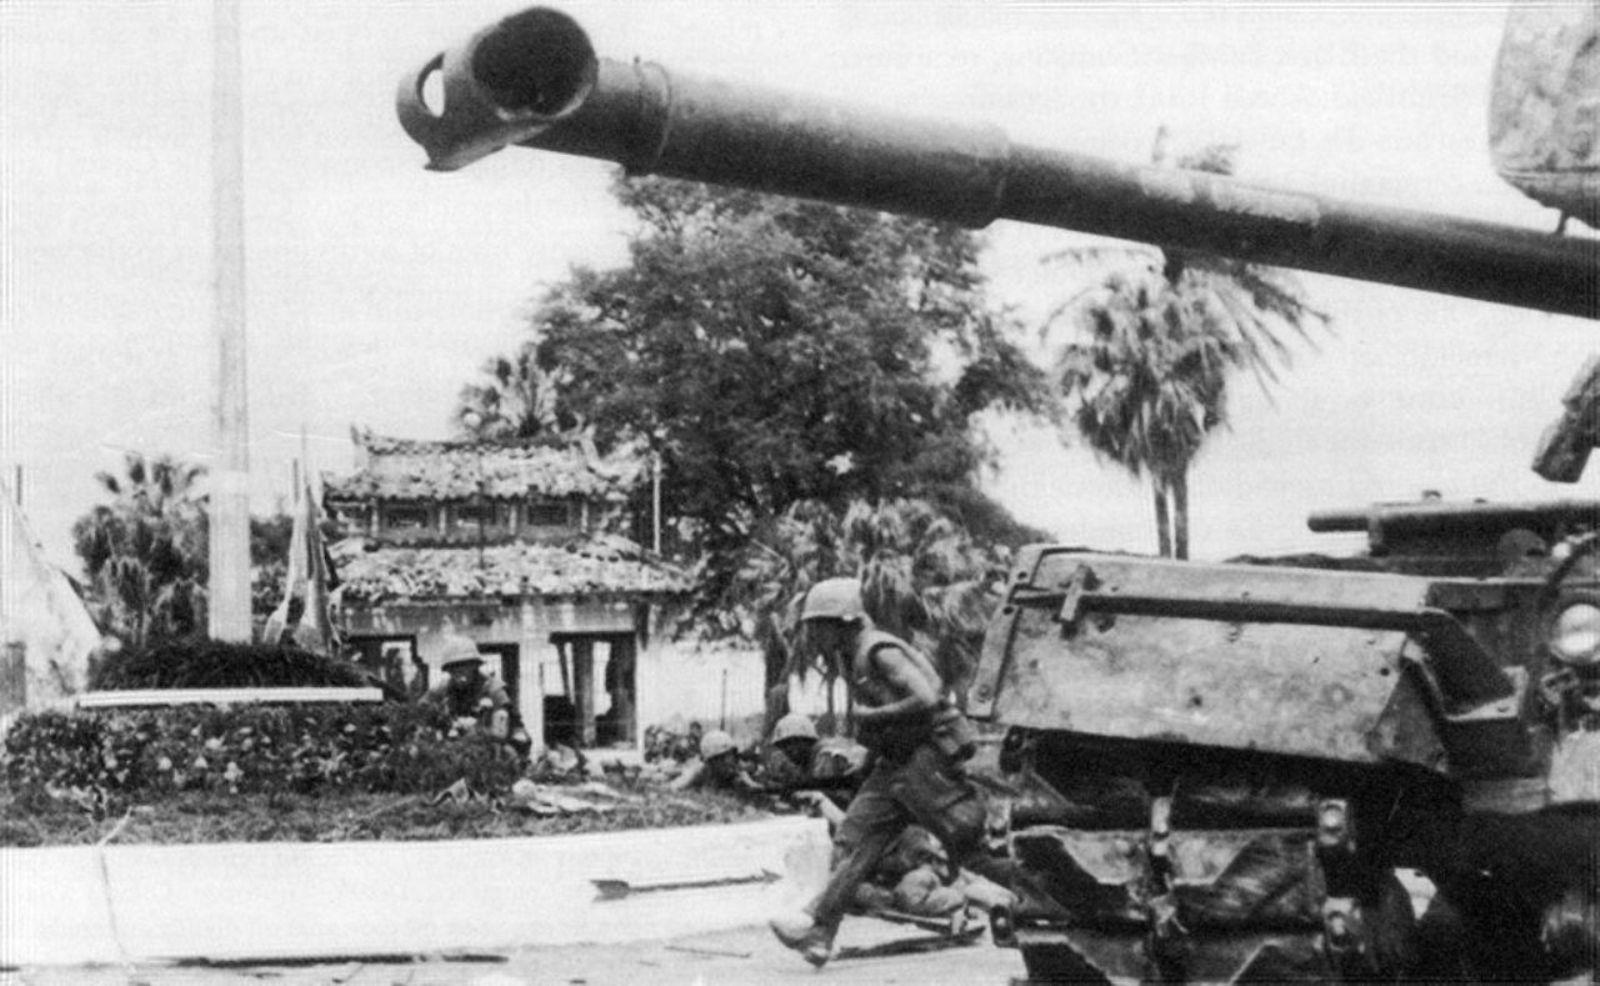 general vo nguyen giap biography us marine during tet offensive 1968